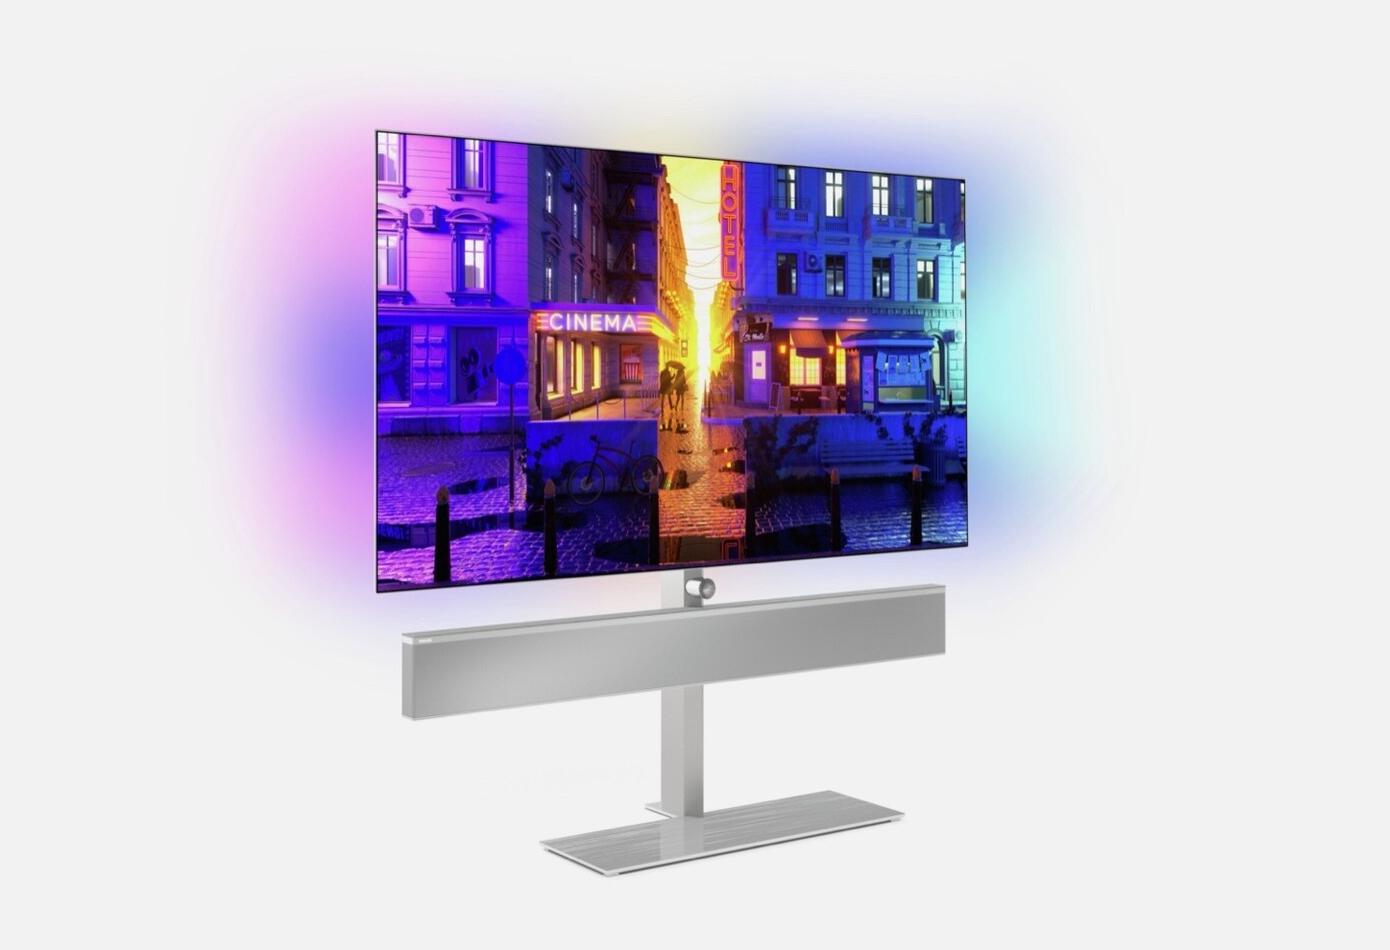 Philips OLED+ TVs